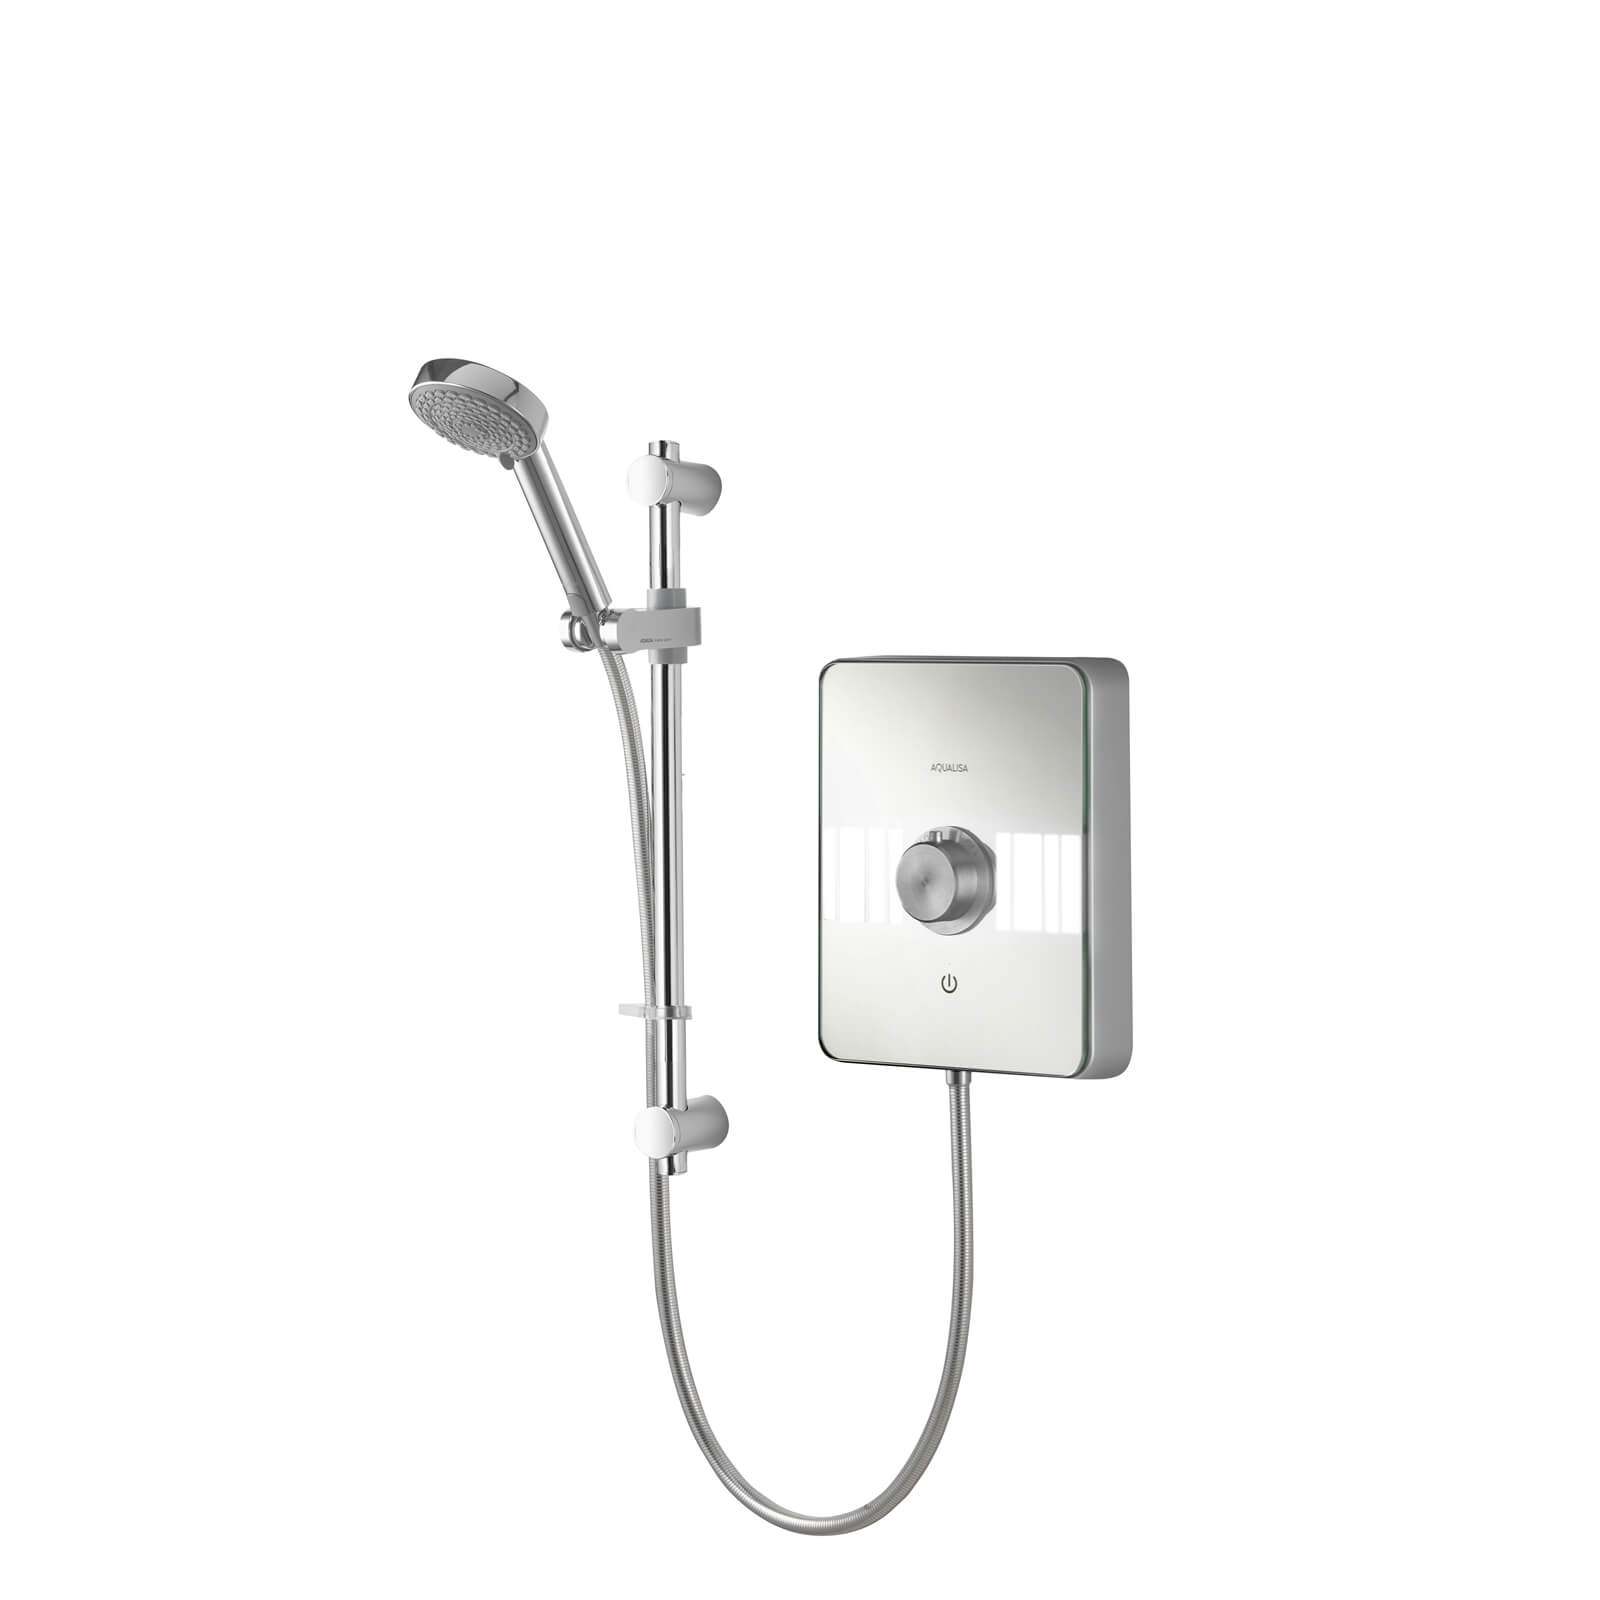 Aqualisa Lumi 10.5kW Electric Shower - Chrome